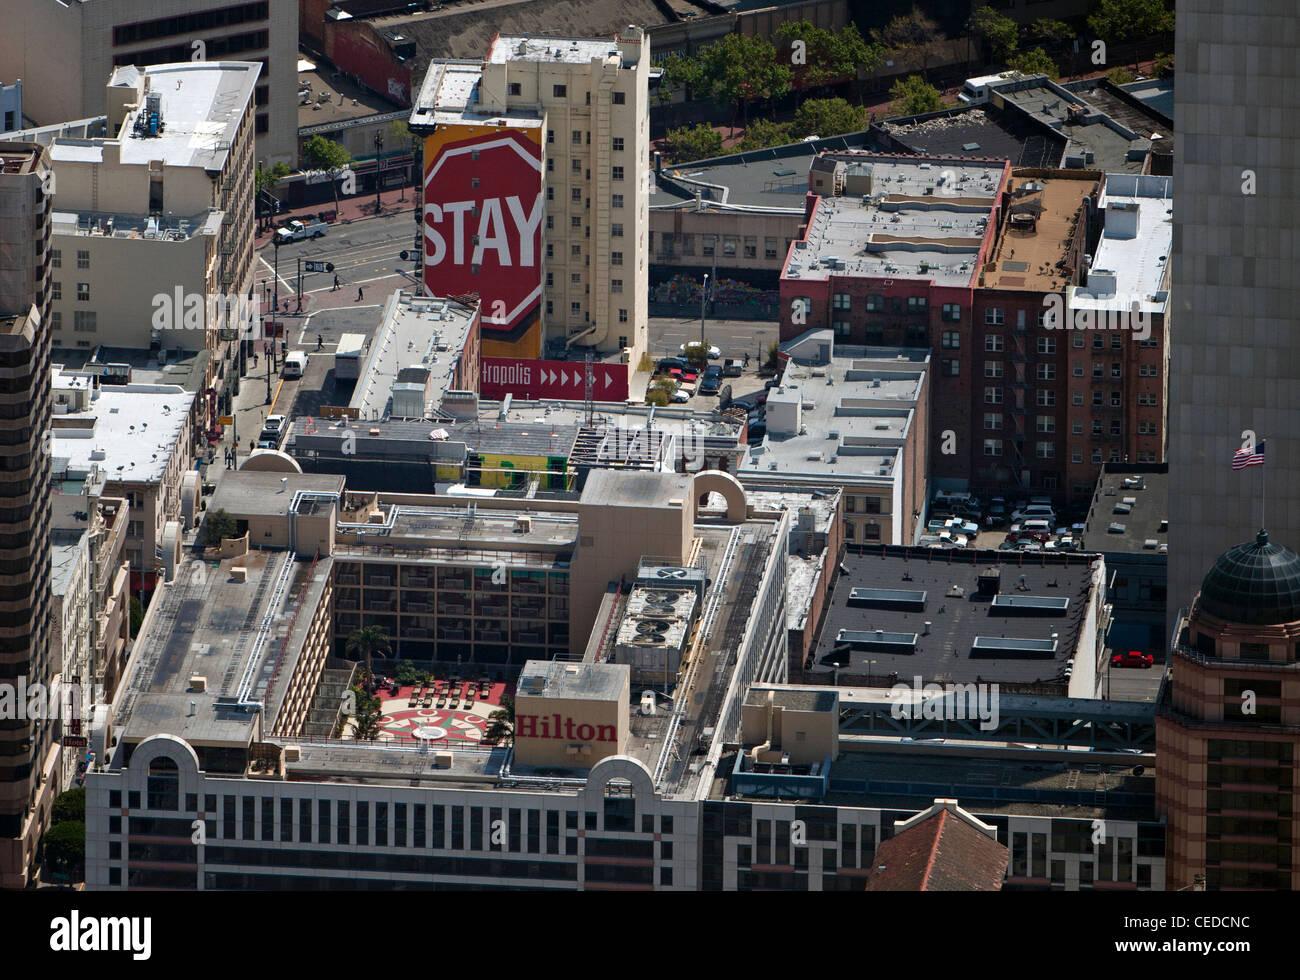 aerial photograph Hilton Hotel San Francisco Union Square, California - Stock Image